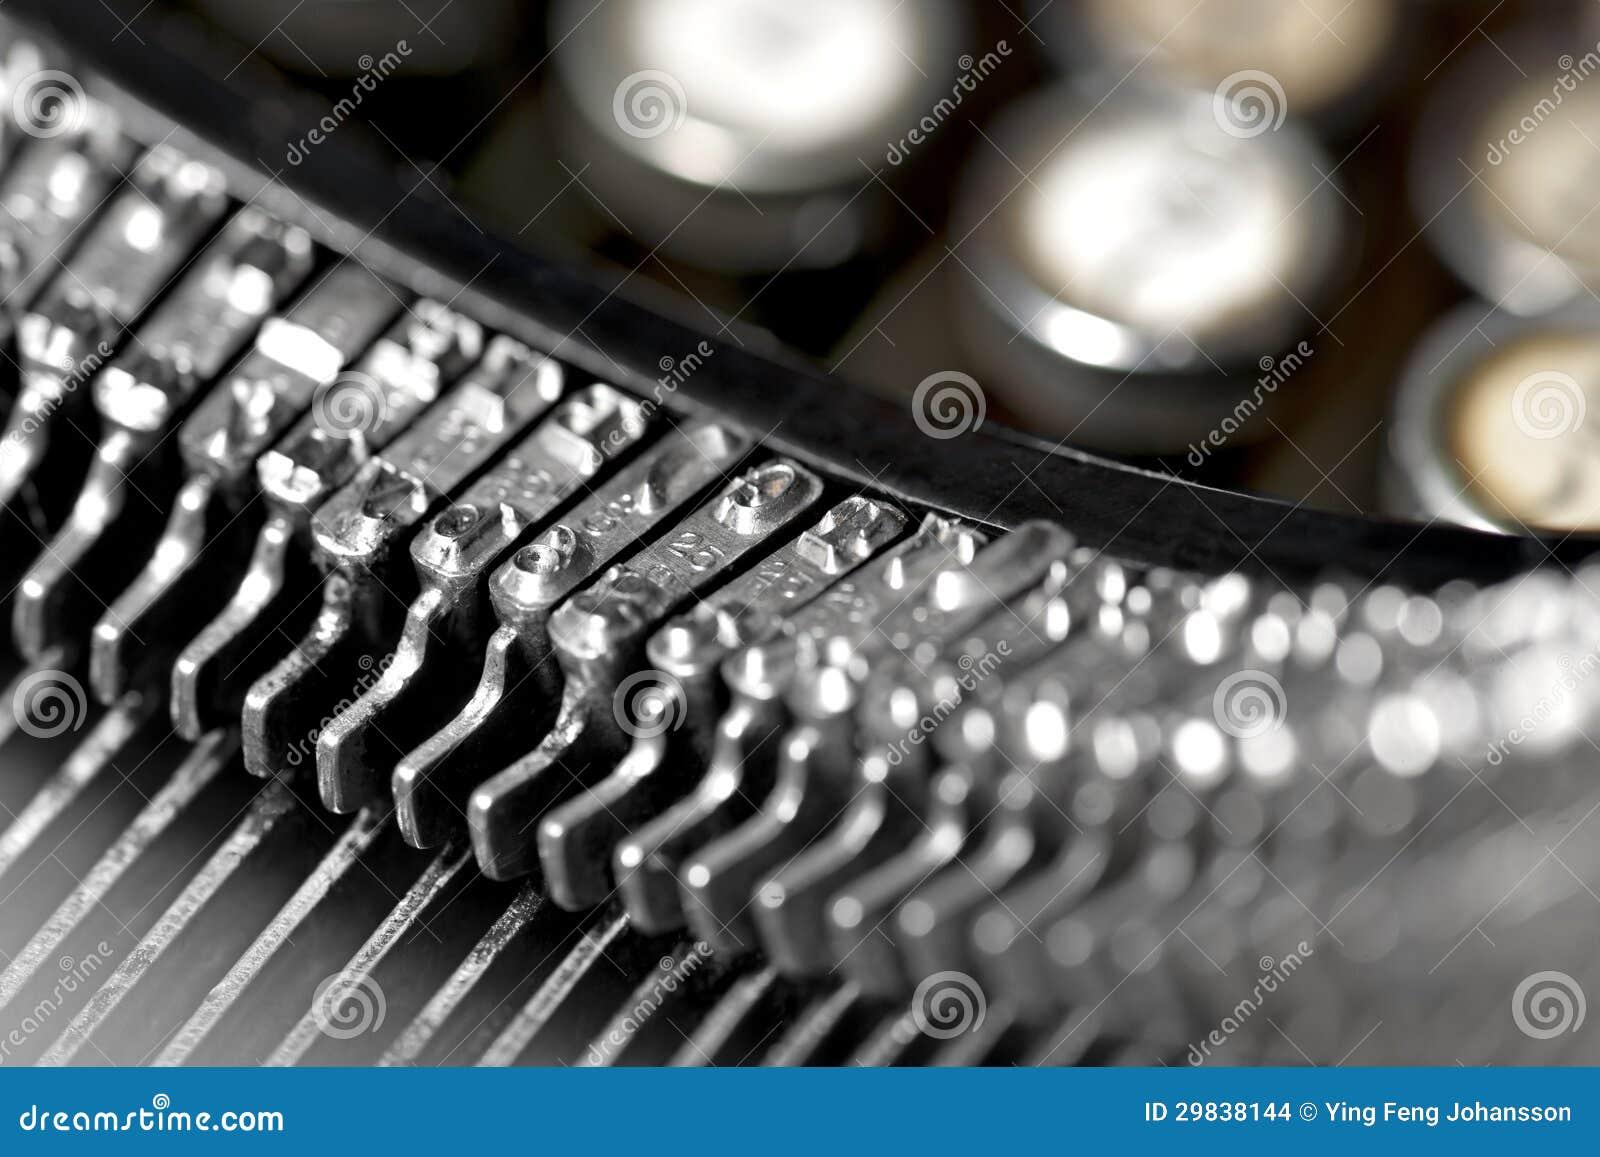 Letras no typevriter do vintage